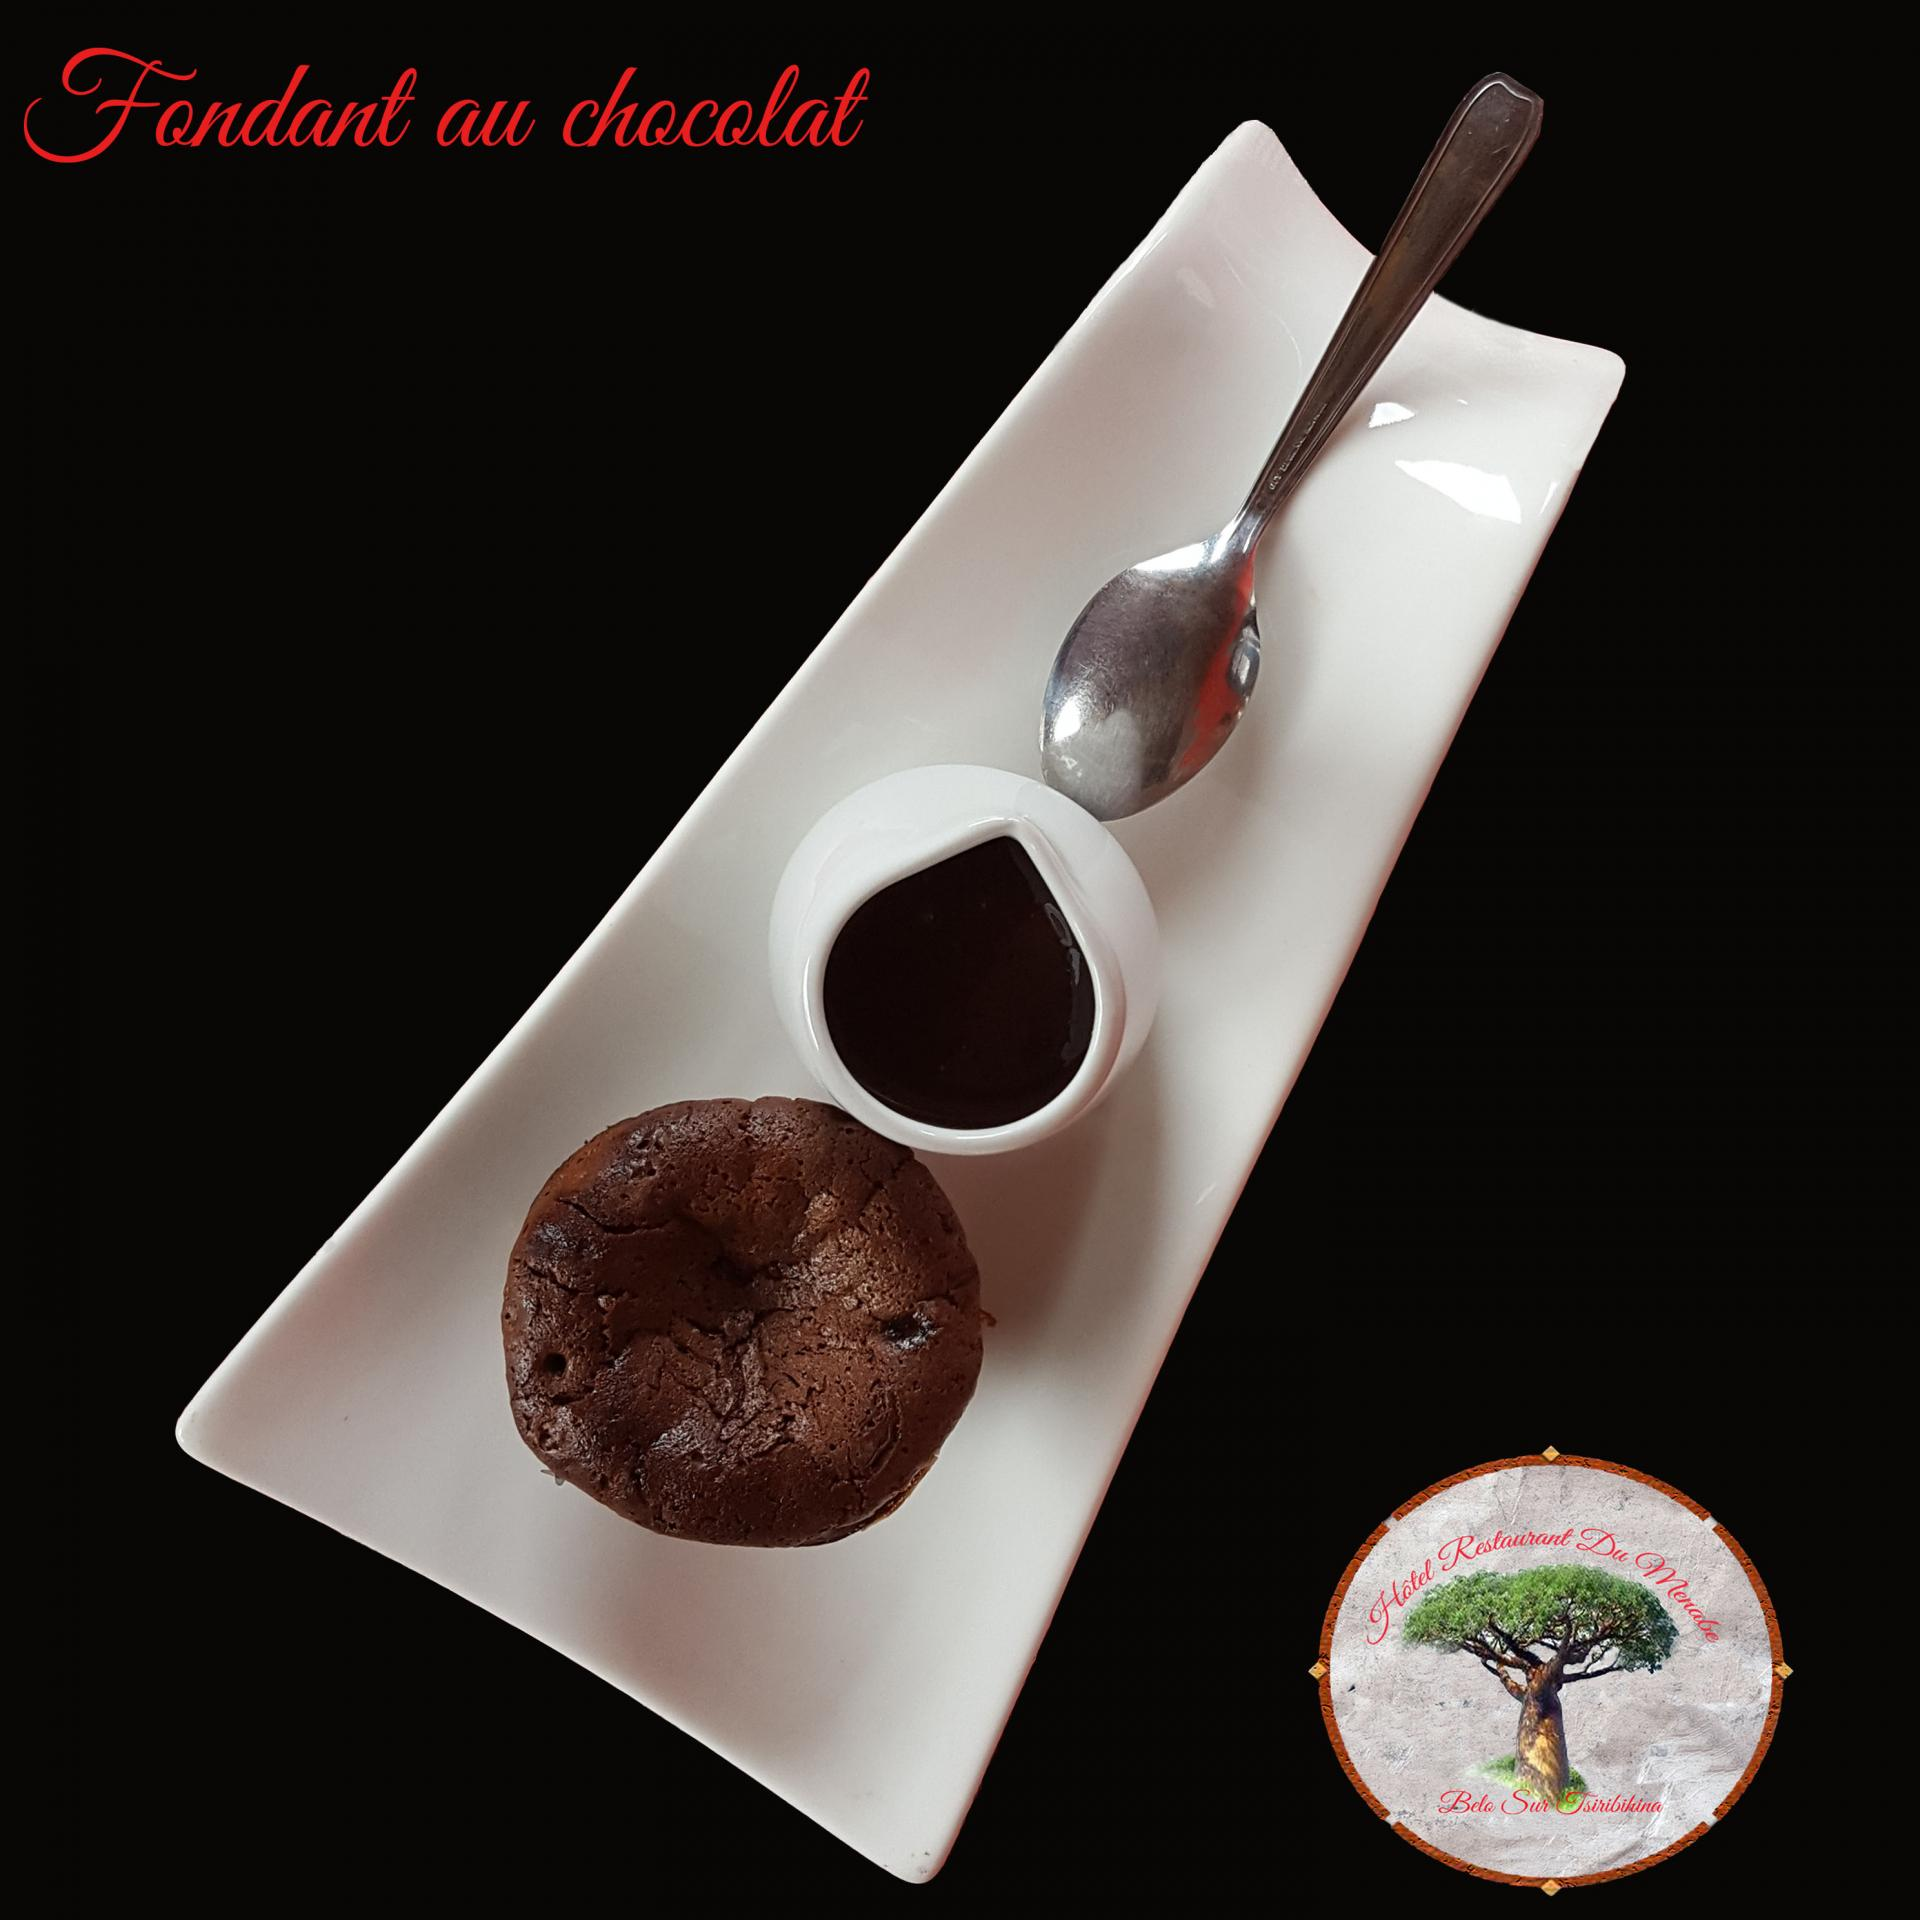 Fondant chocolat restaurant du menabe